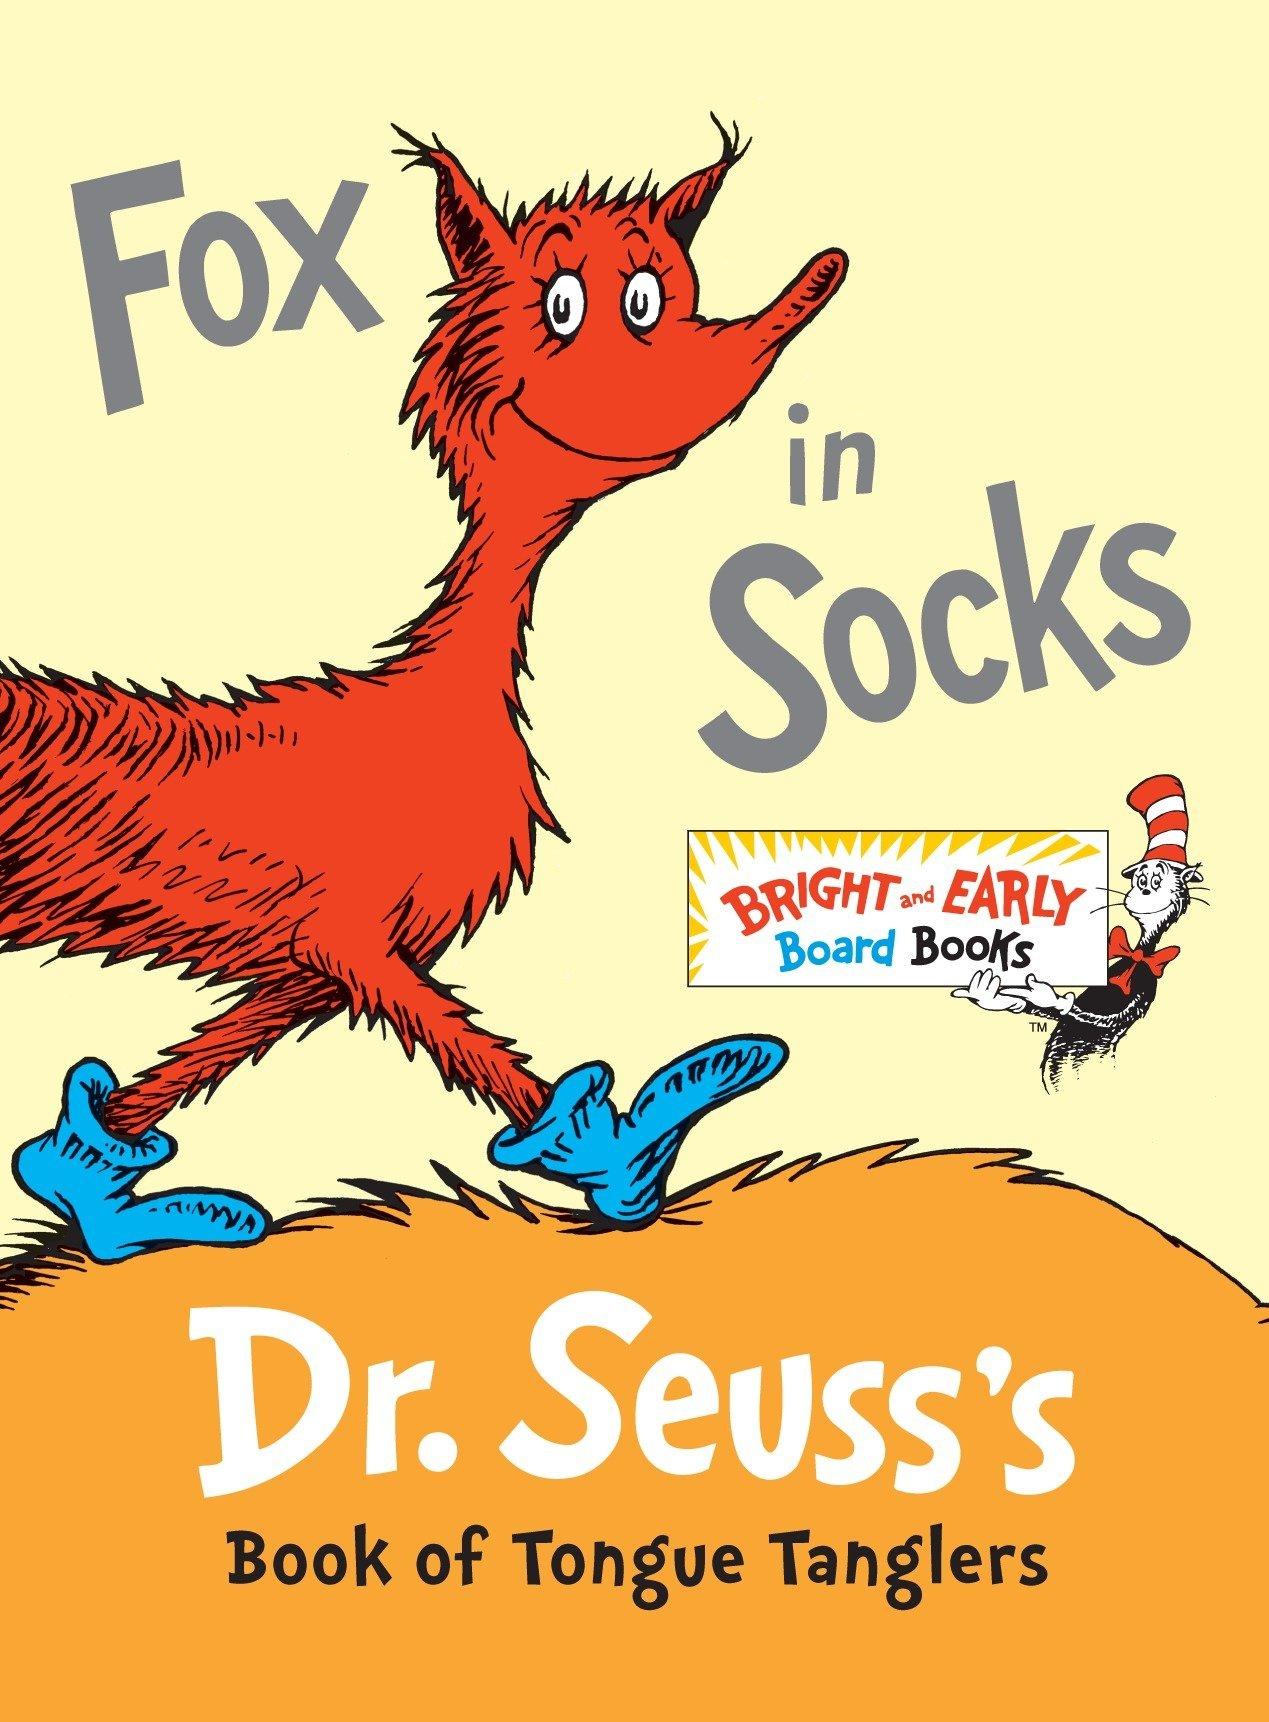 Amazon.com: Fox in Socks: Dr. Seuss's Book of Tongue Tanglers.